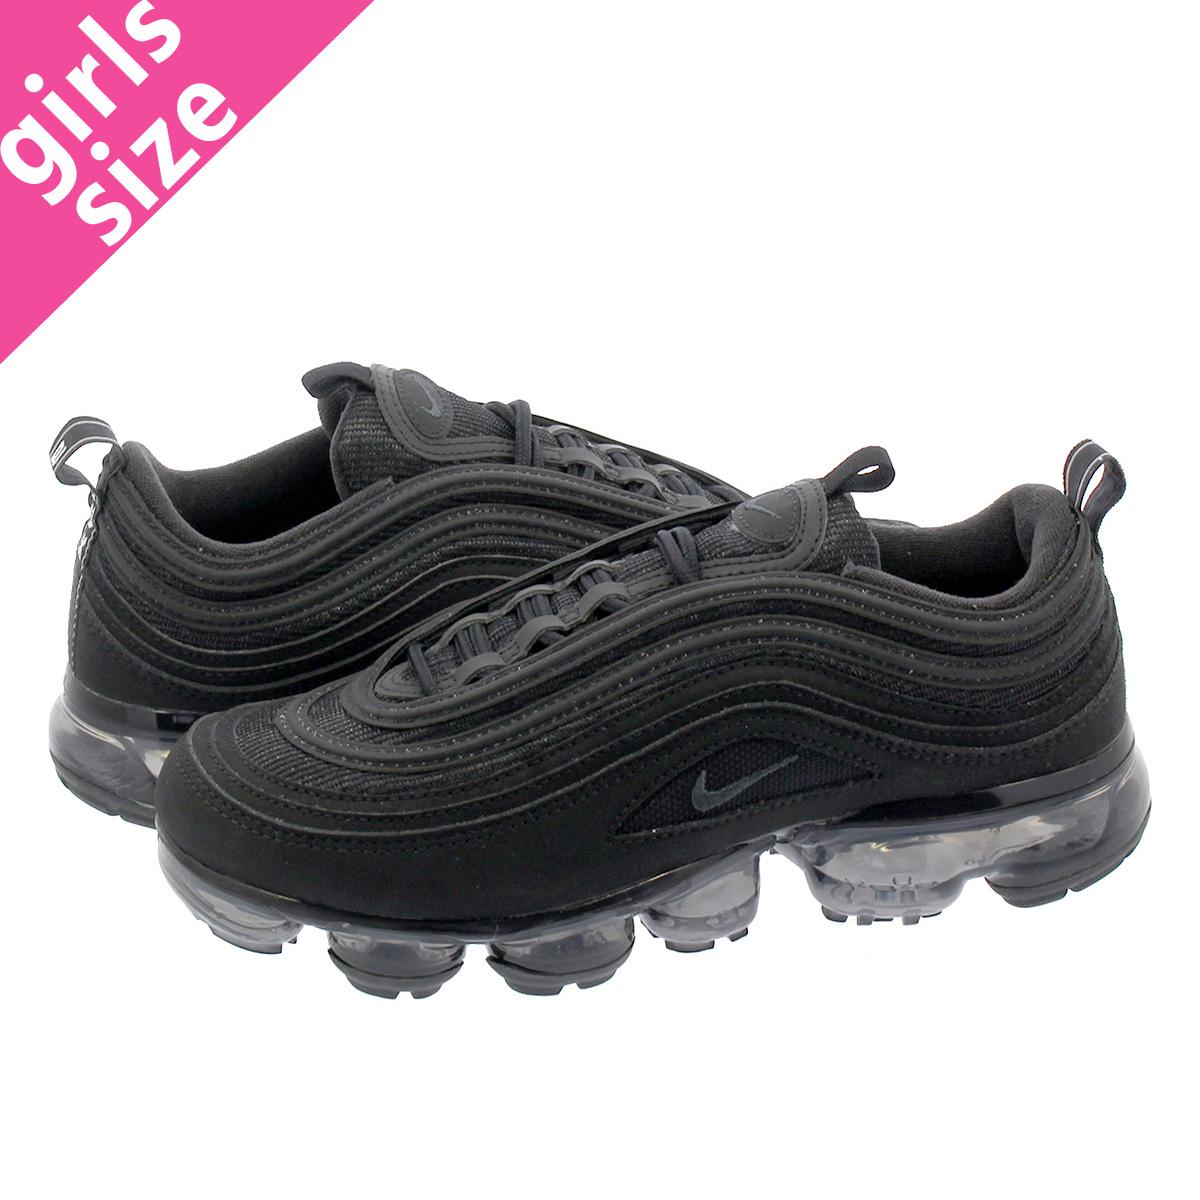 finest selection bc8bd ce6e0 NIKE AIR VAPORMAX 97 GS Nike air vapor max 97 GS BLACK/BLACK aq2657-001